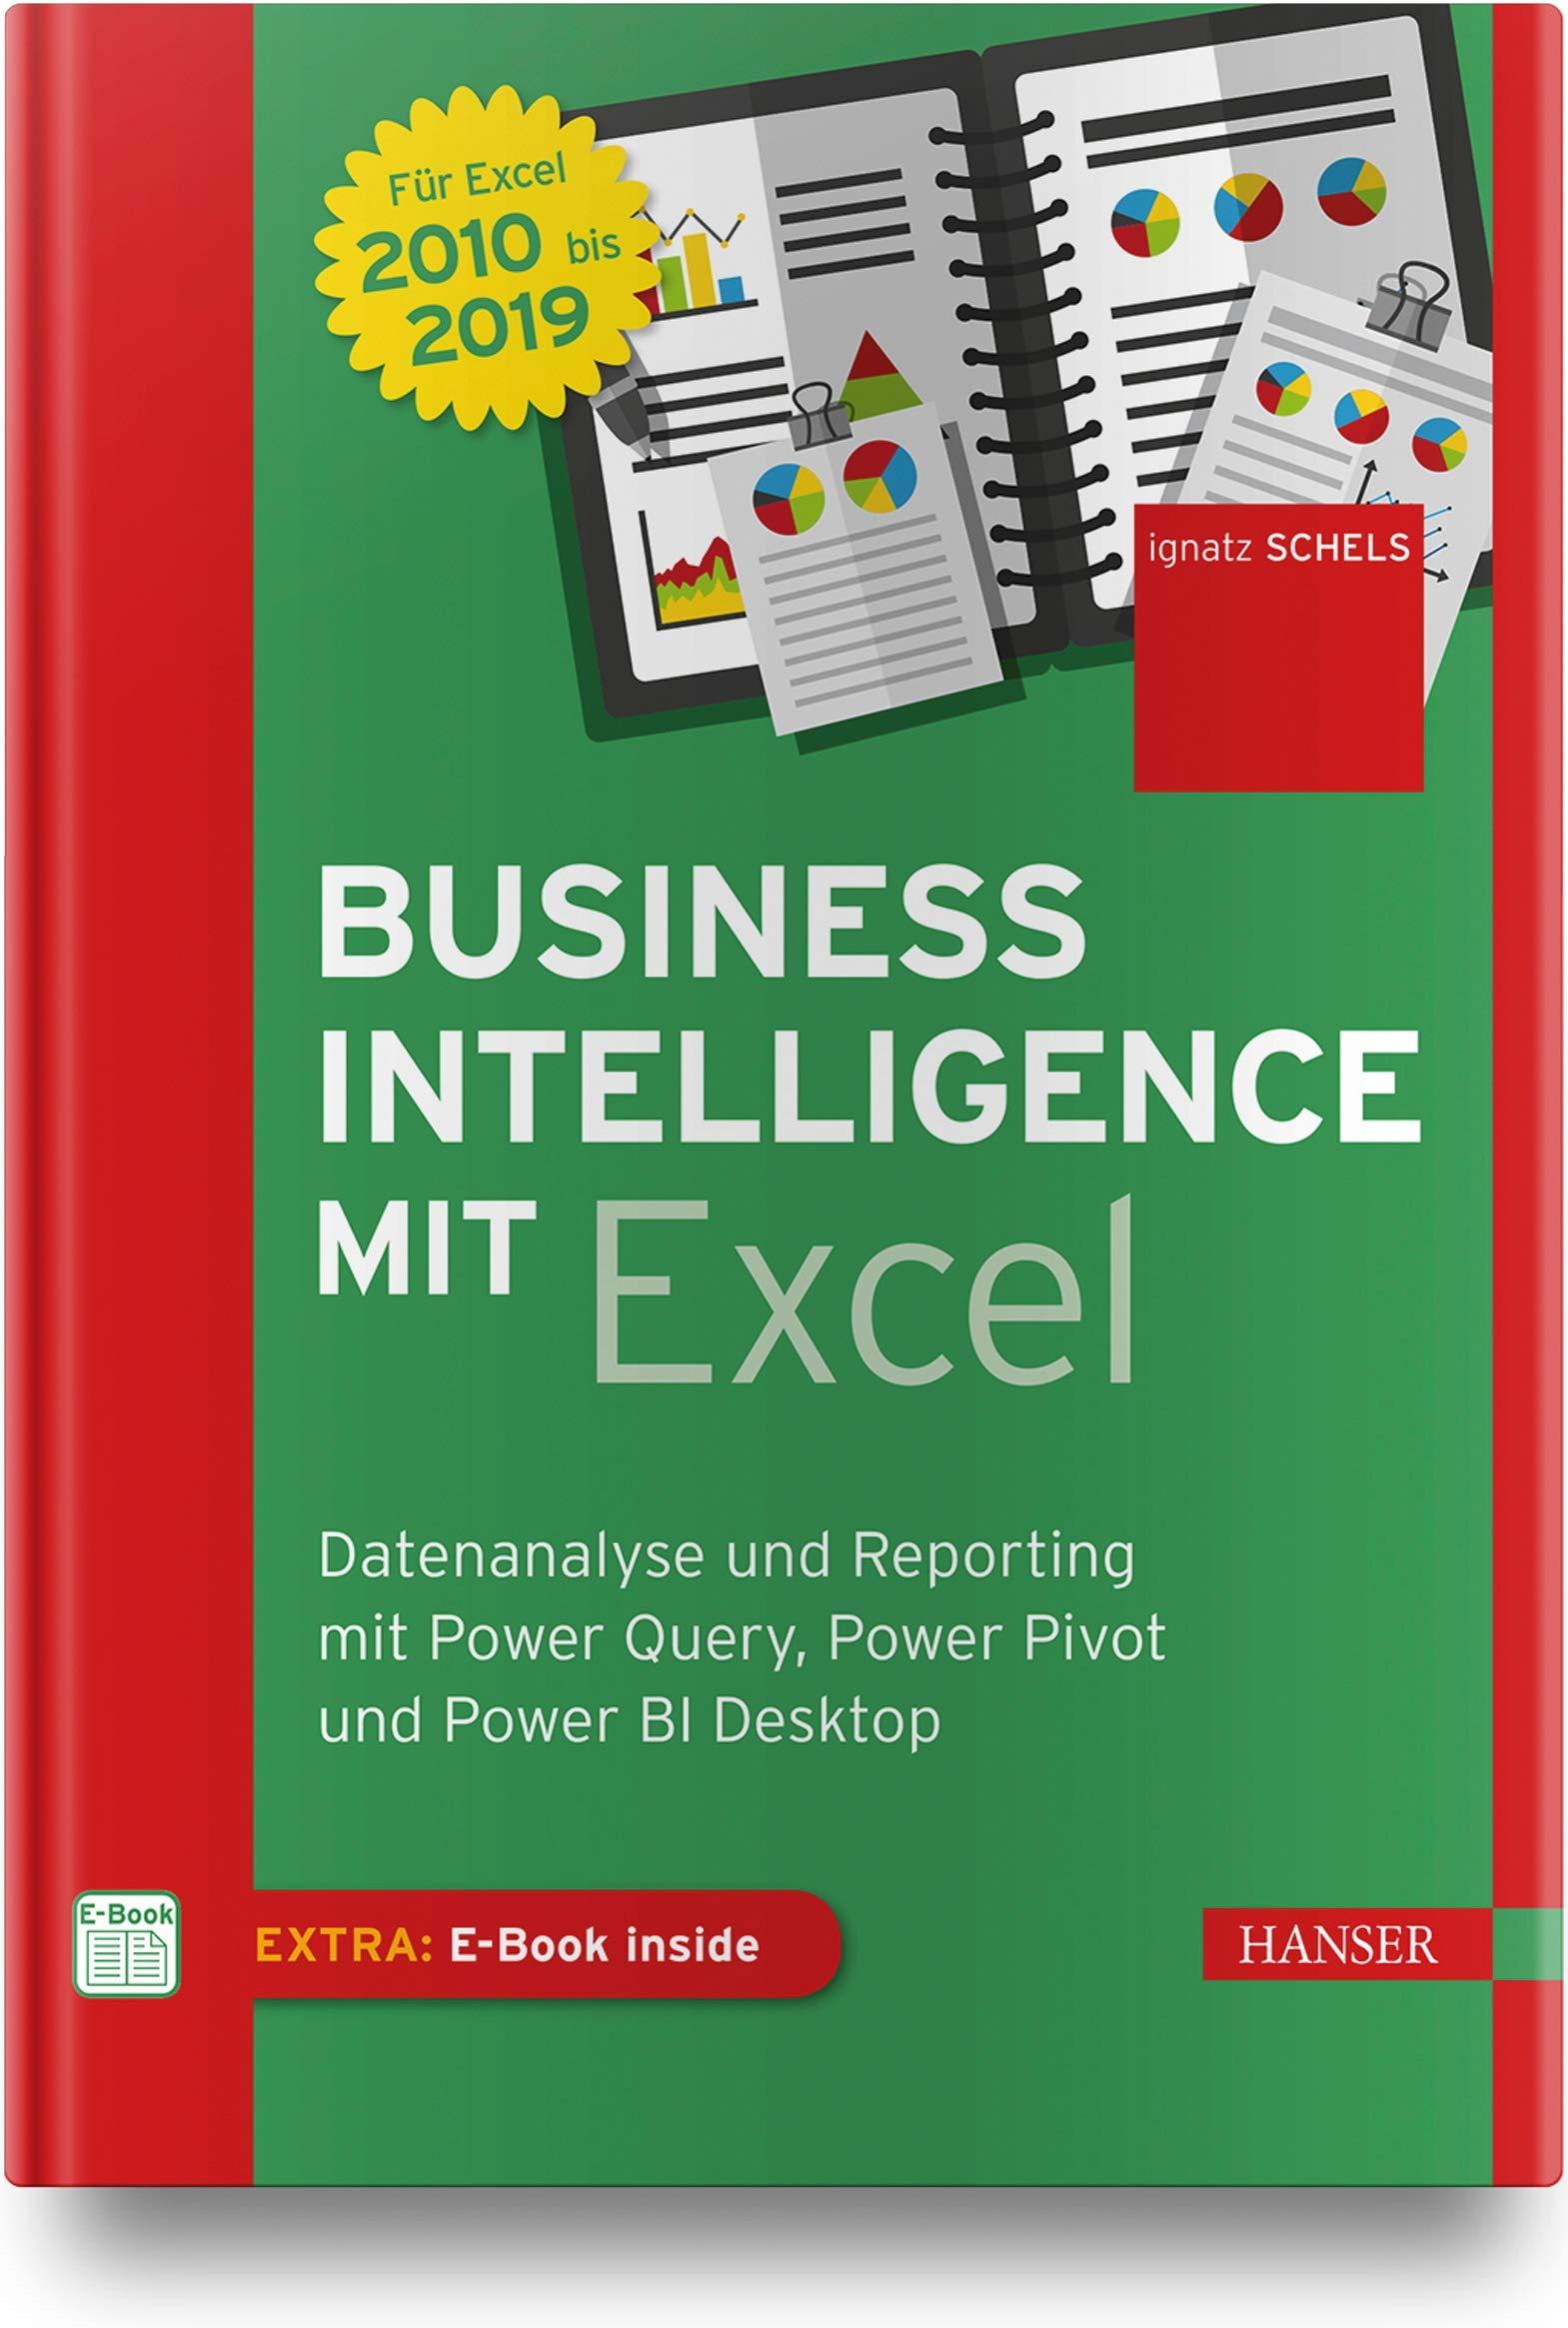 Business Intelligence mit Excel: Datenanalyse und Reporting ...